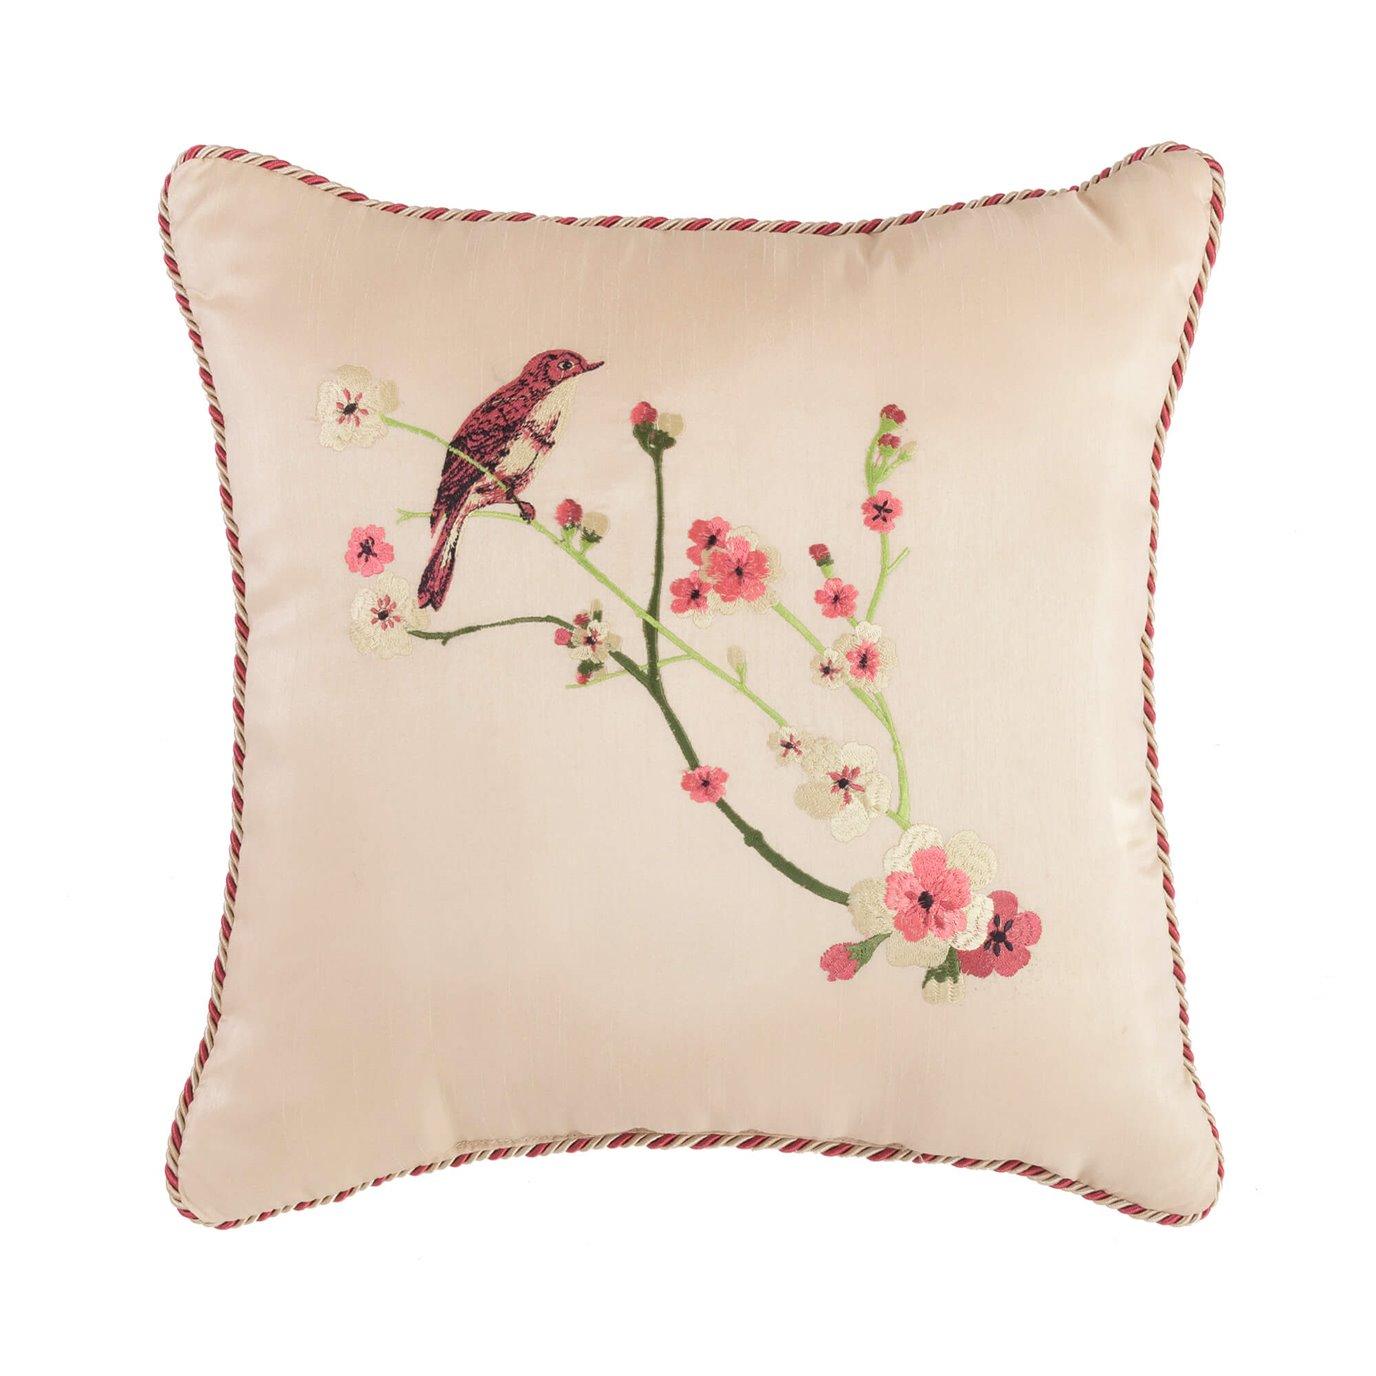 Croscill Blyth Fashion Pillow